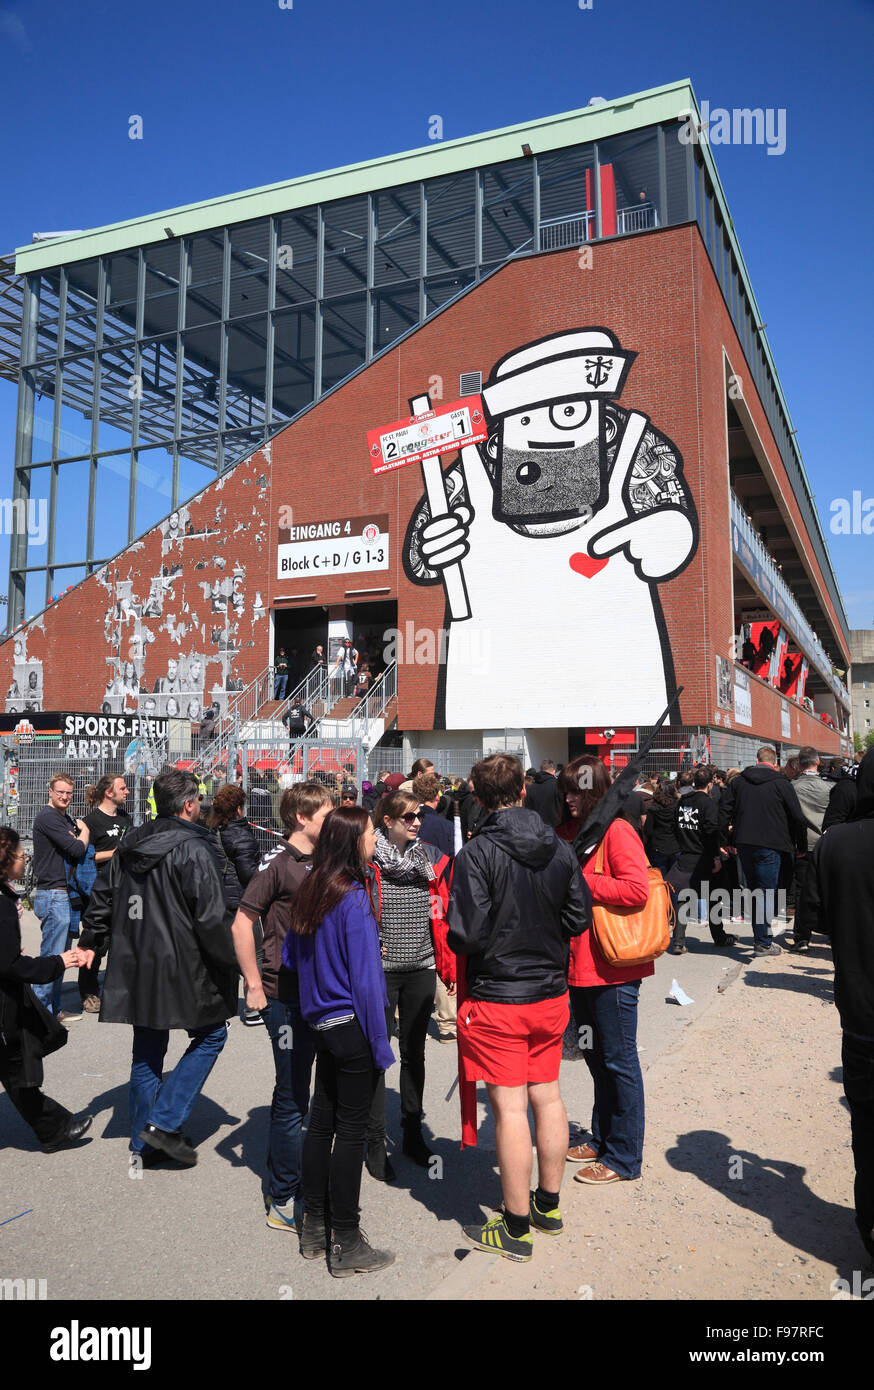 Fans of FC St. Pauli football club at Millerntor Stadium, St.Pauli, Hamburg, Germany, Europe - Stock Image